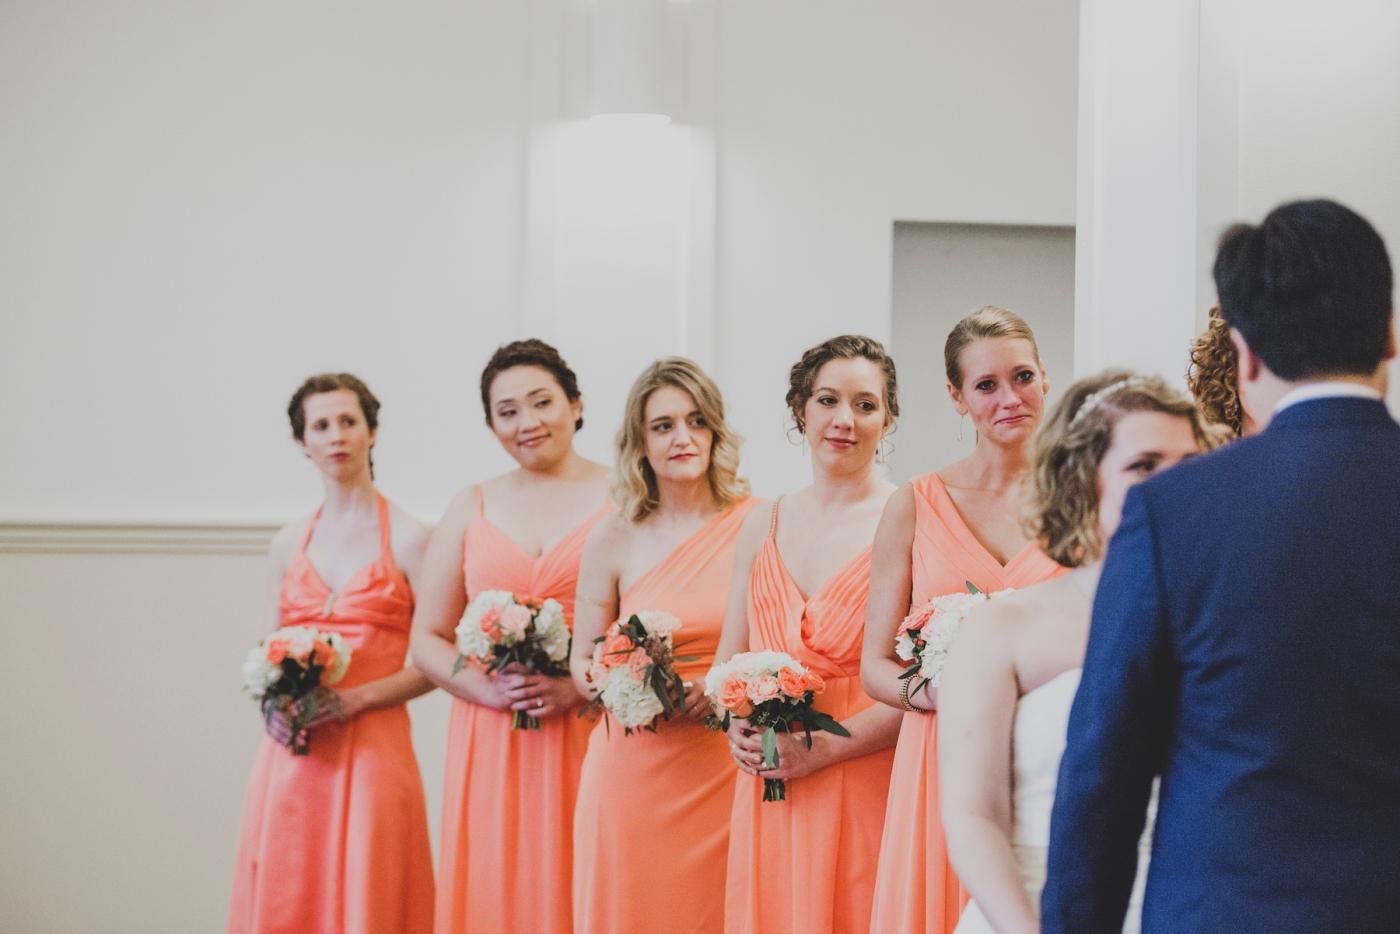 DSC_2619Everett_Wedding_Ballroom_Jane_Speleers_photography_Rachel_and_Edmund_Ceremony_2017